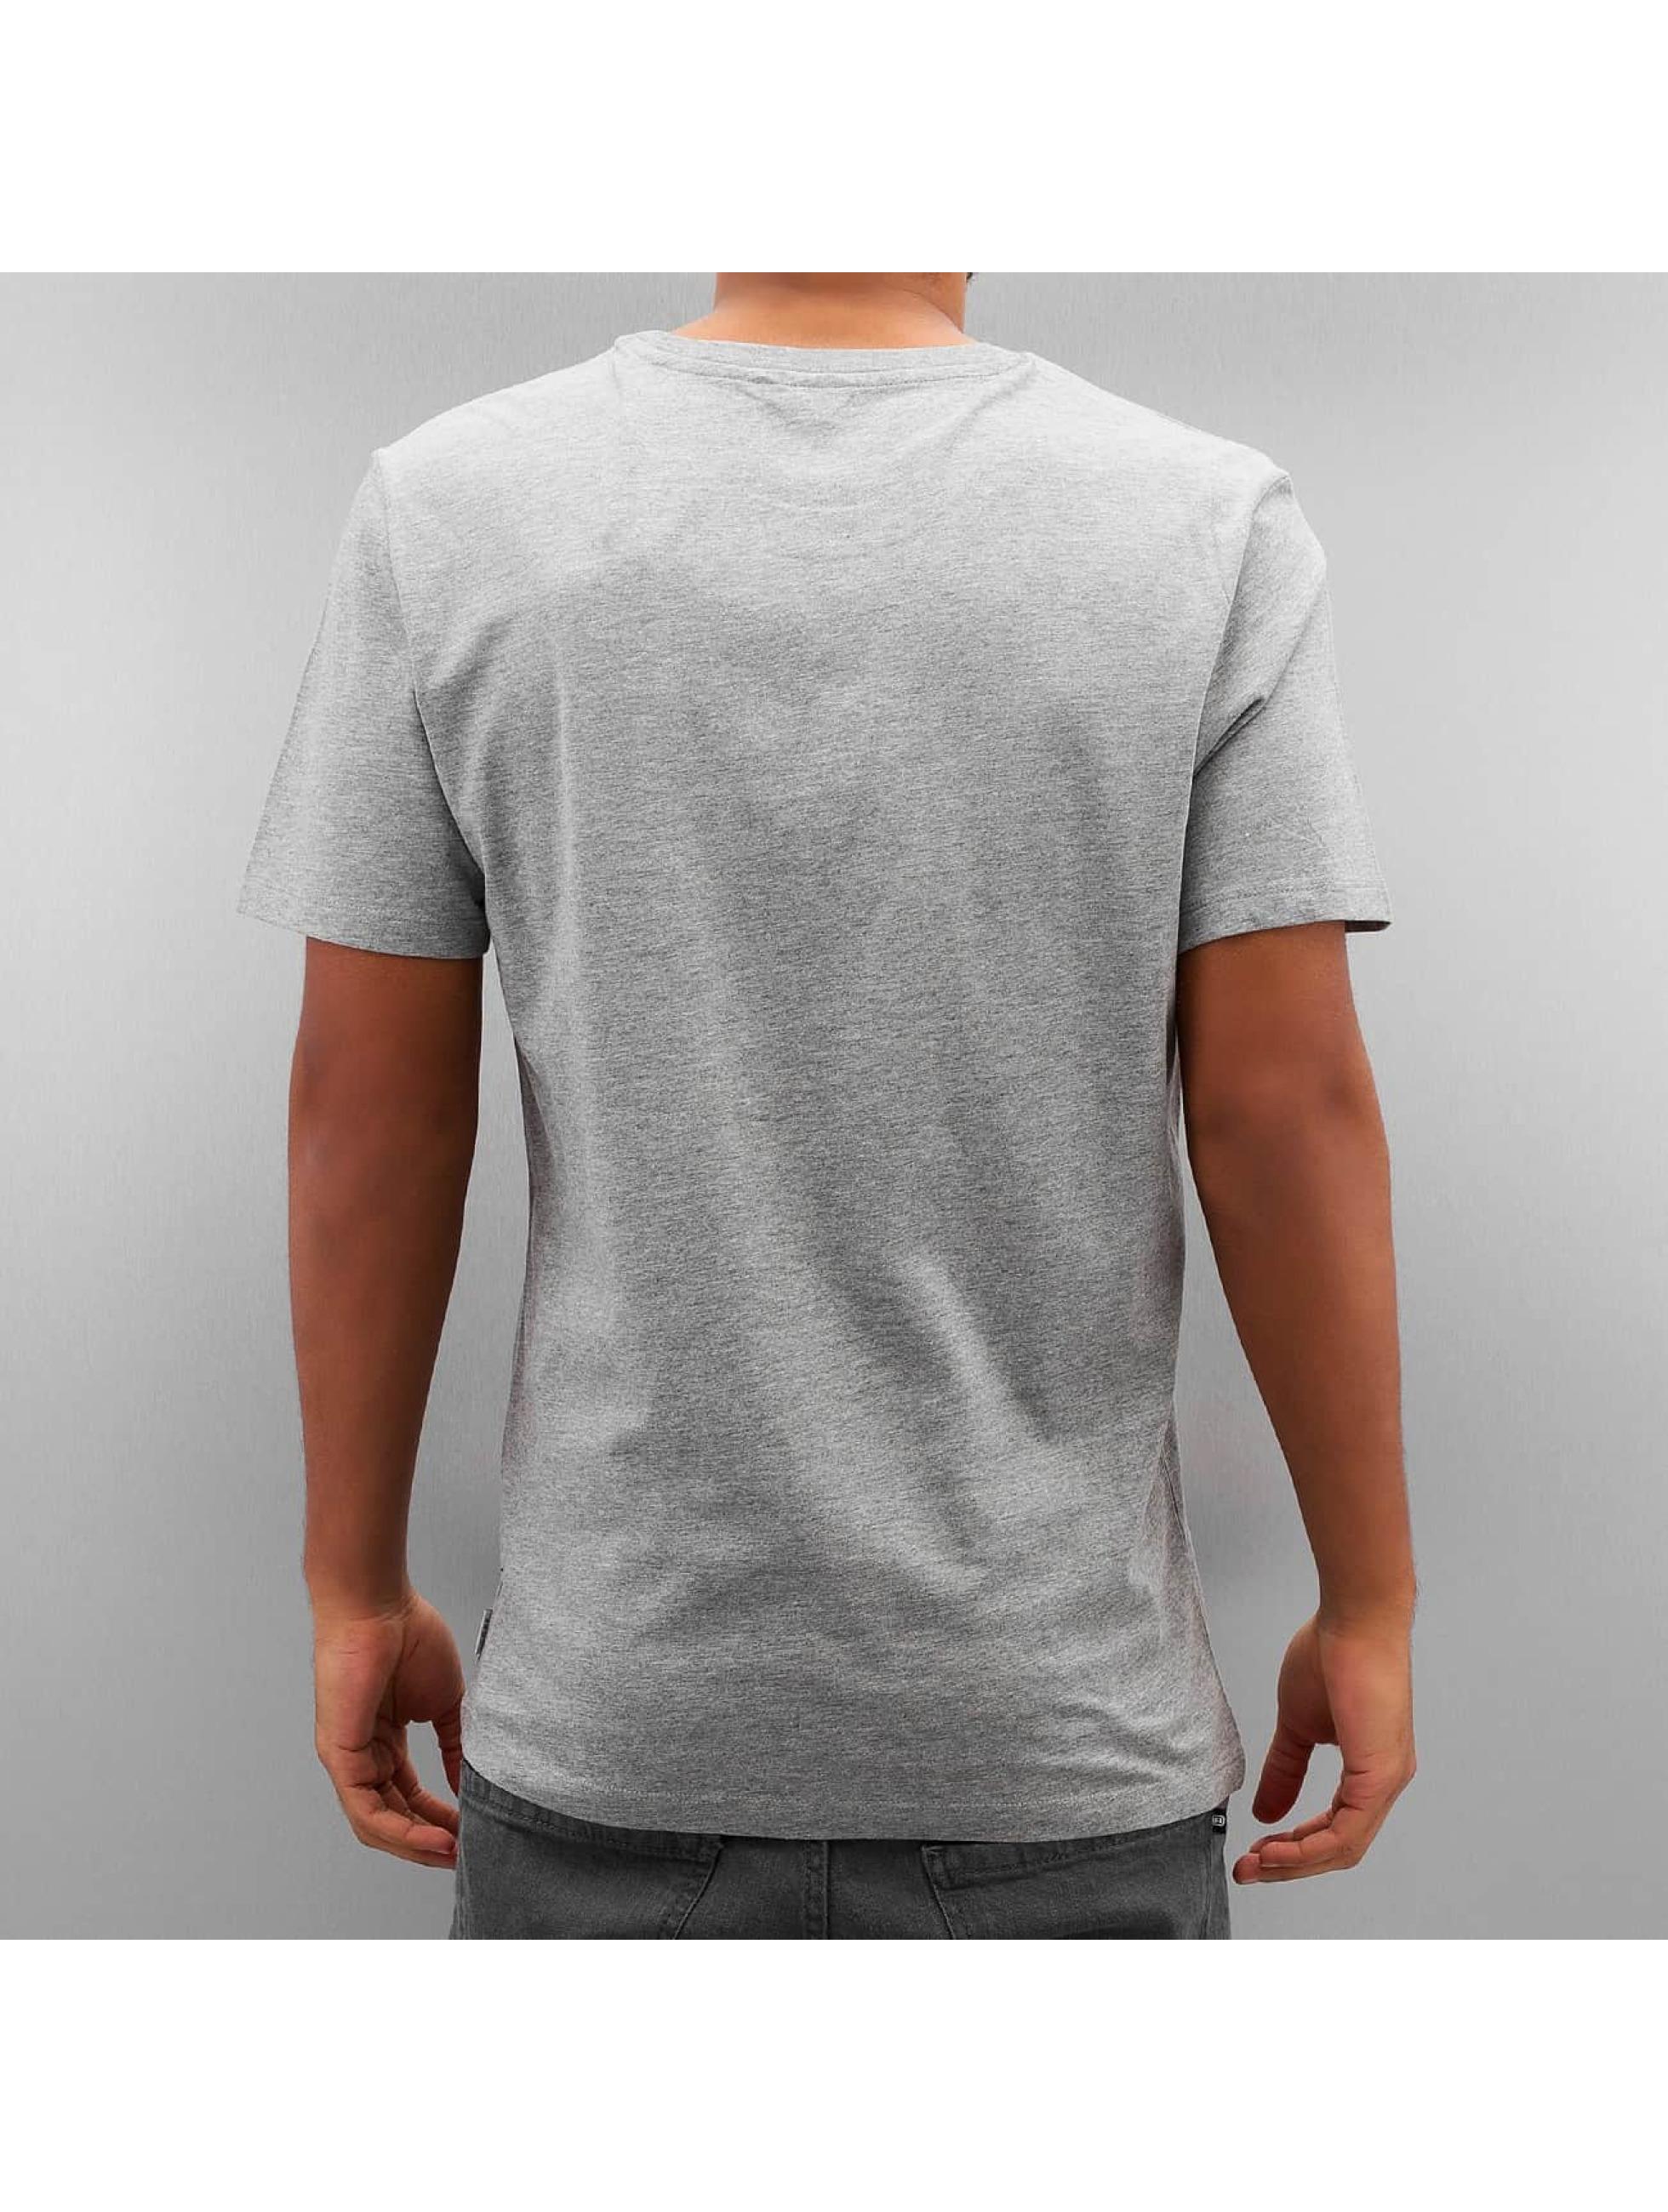 Jack-amp-Jones-Uomini-Maglieria-T-shirt-jcoBiard-grigio-294871-M